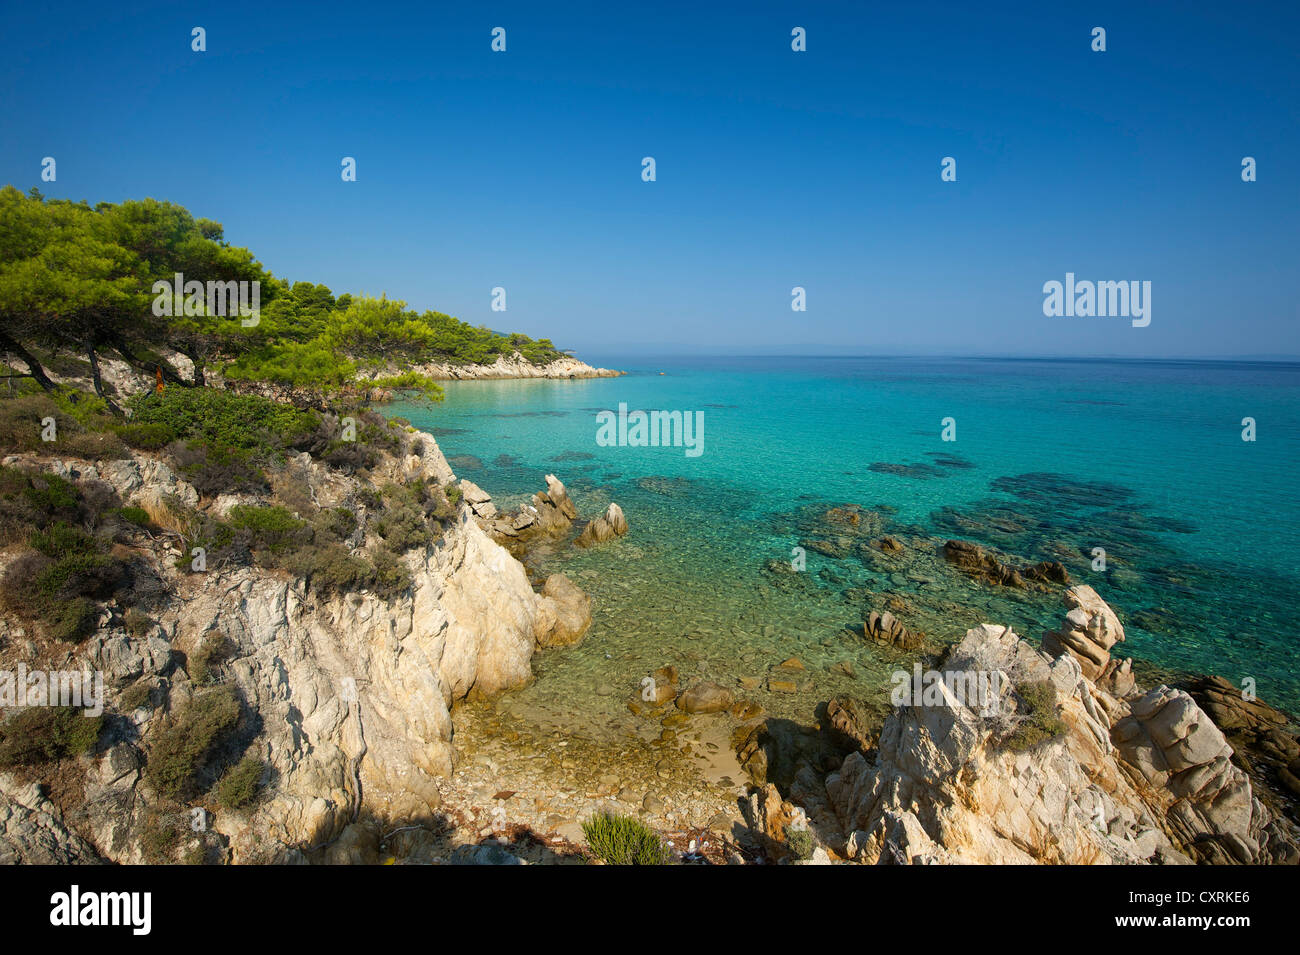 Coast, Kavourotypes Beach on Sithonia peninsula, Halkidiki, Greece, Europe Stock Photo